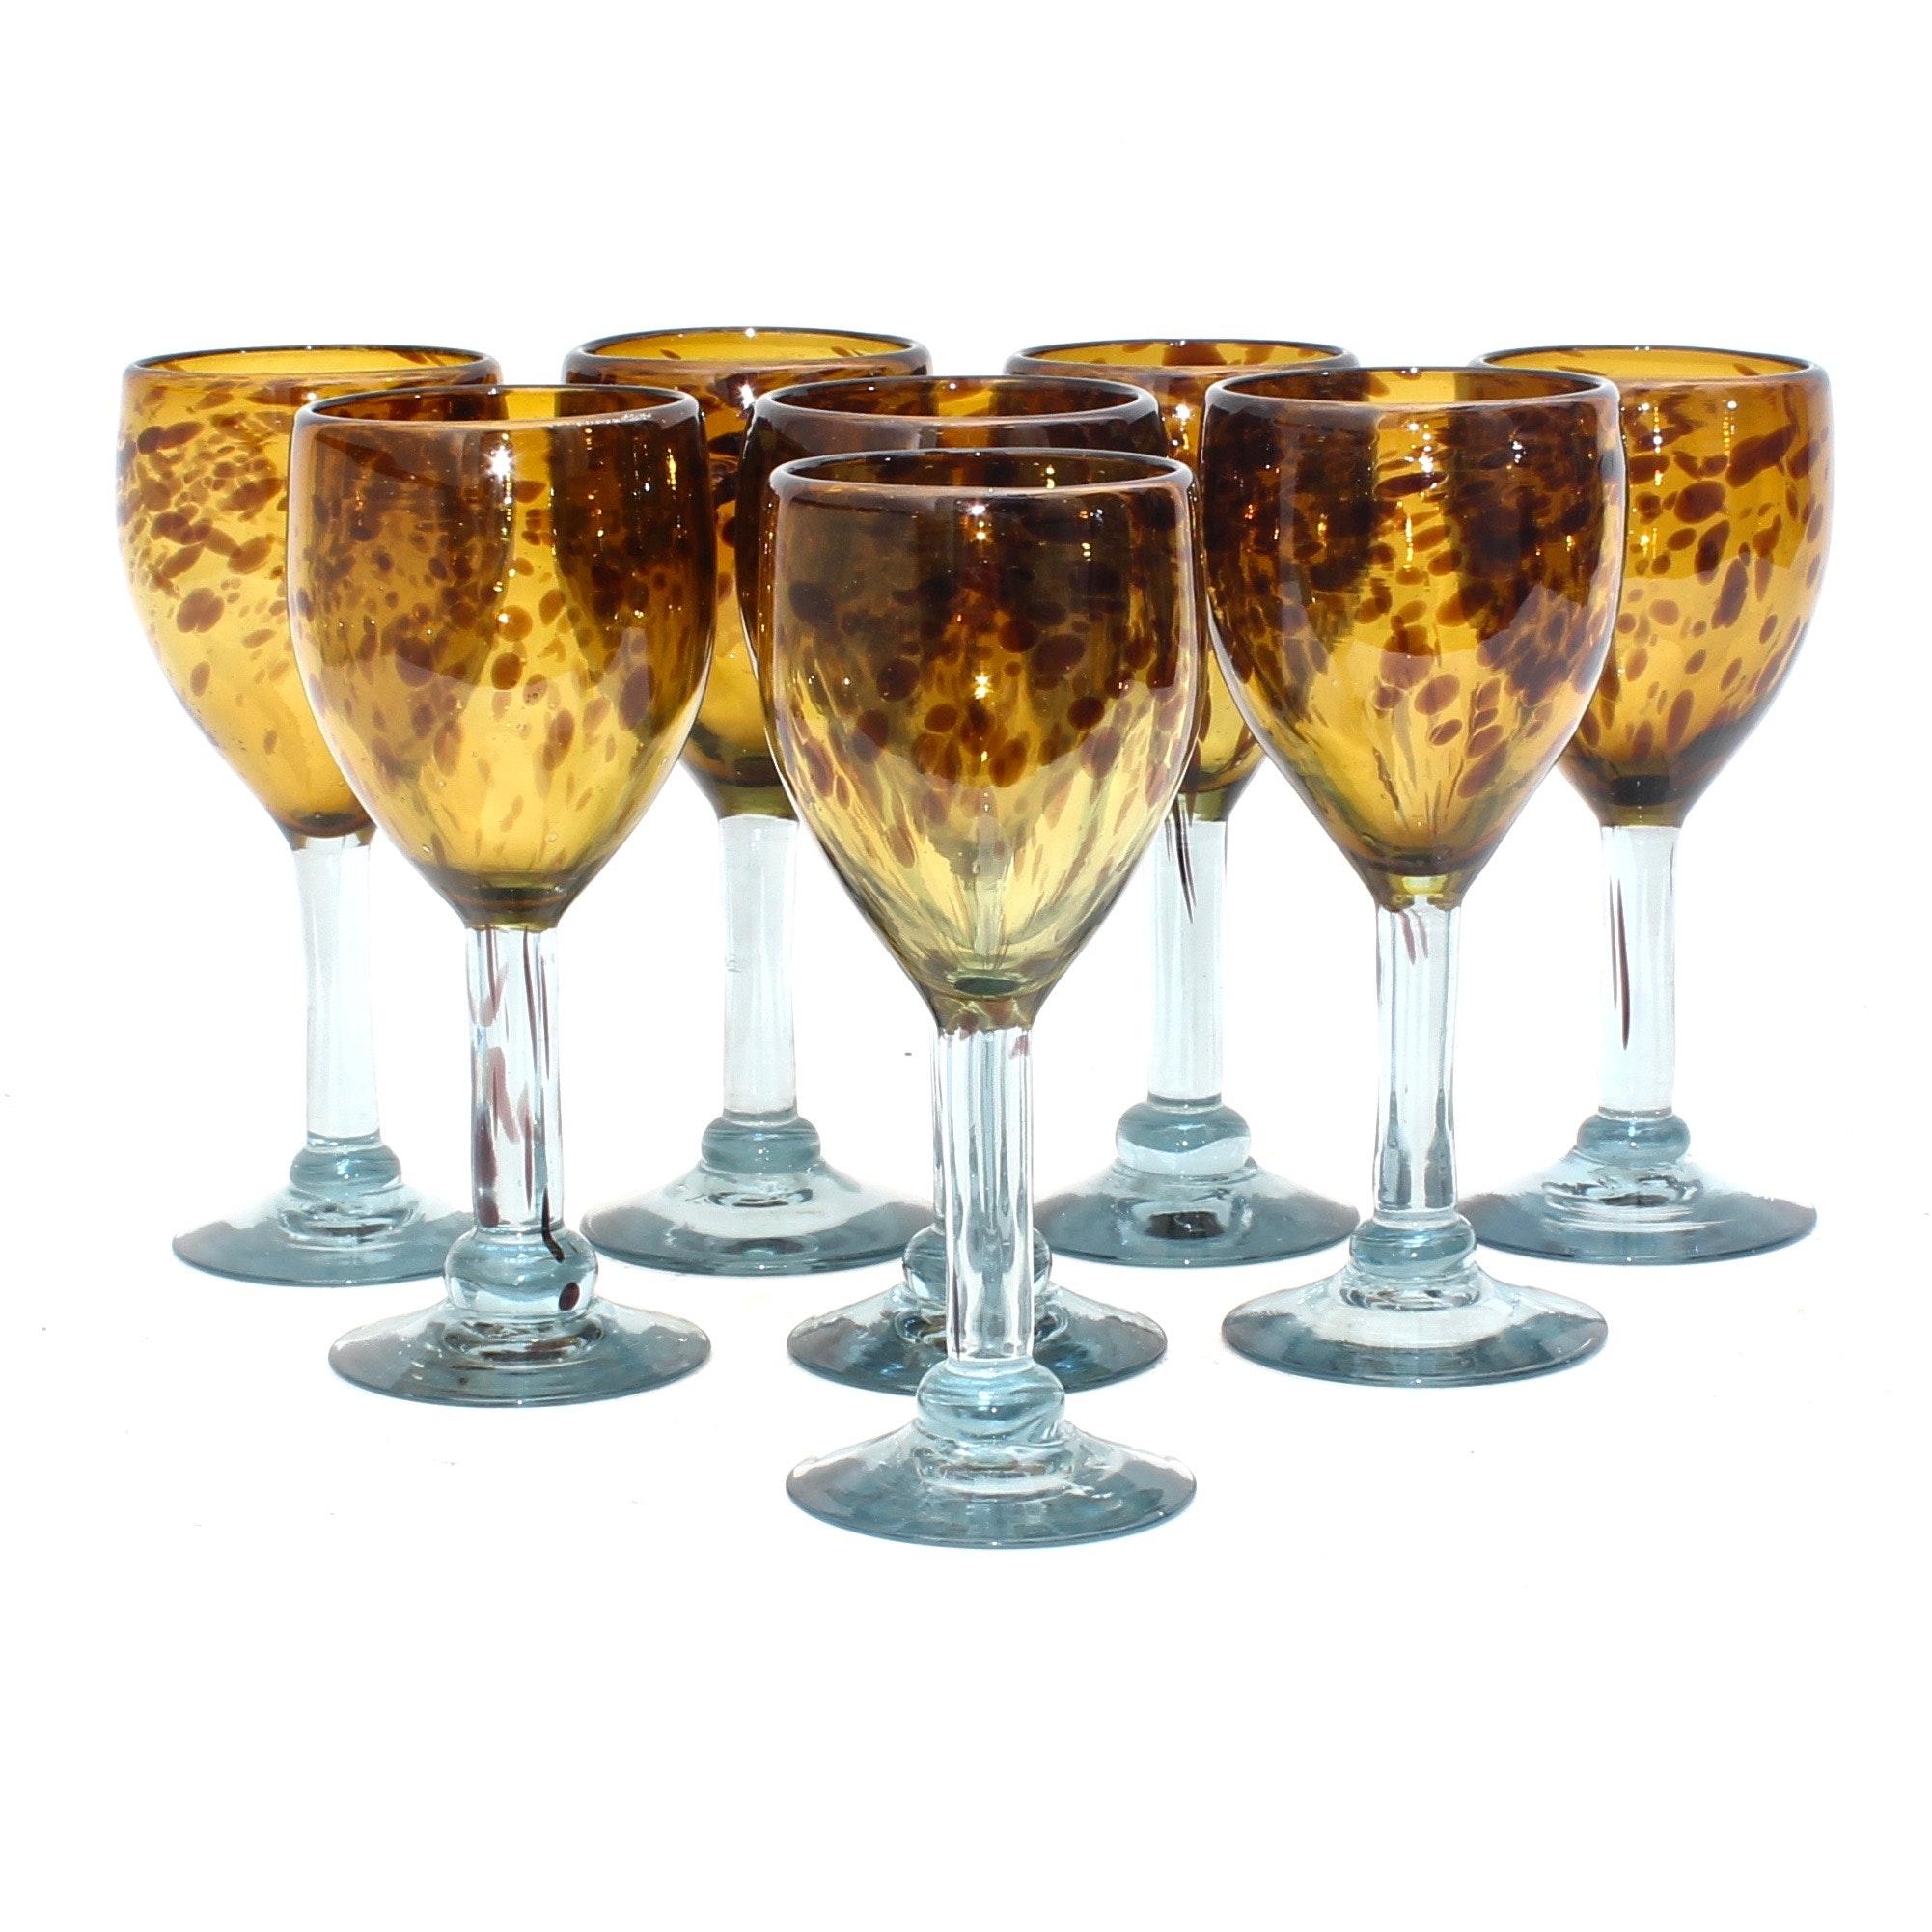 Hand-Blown Tortoiseshell Patterned Wine Glasses